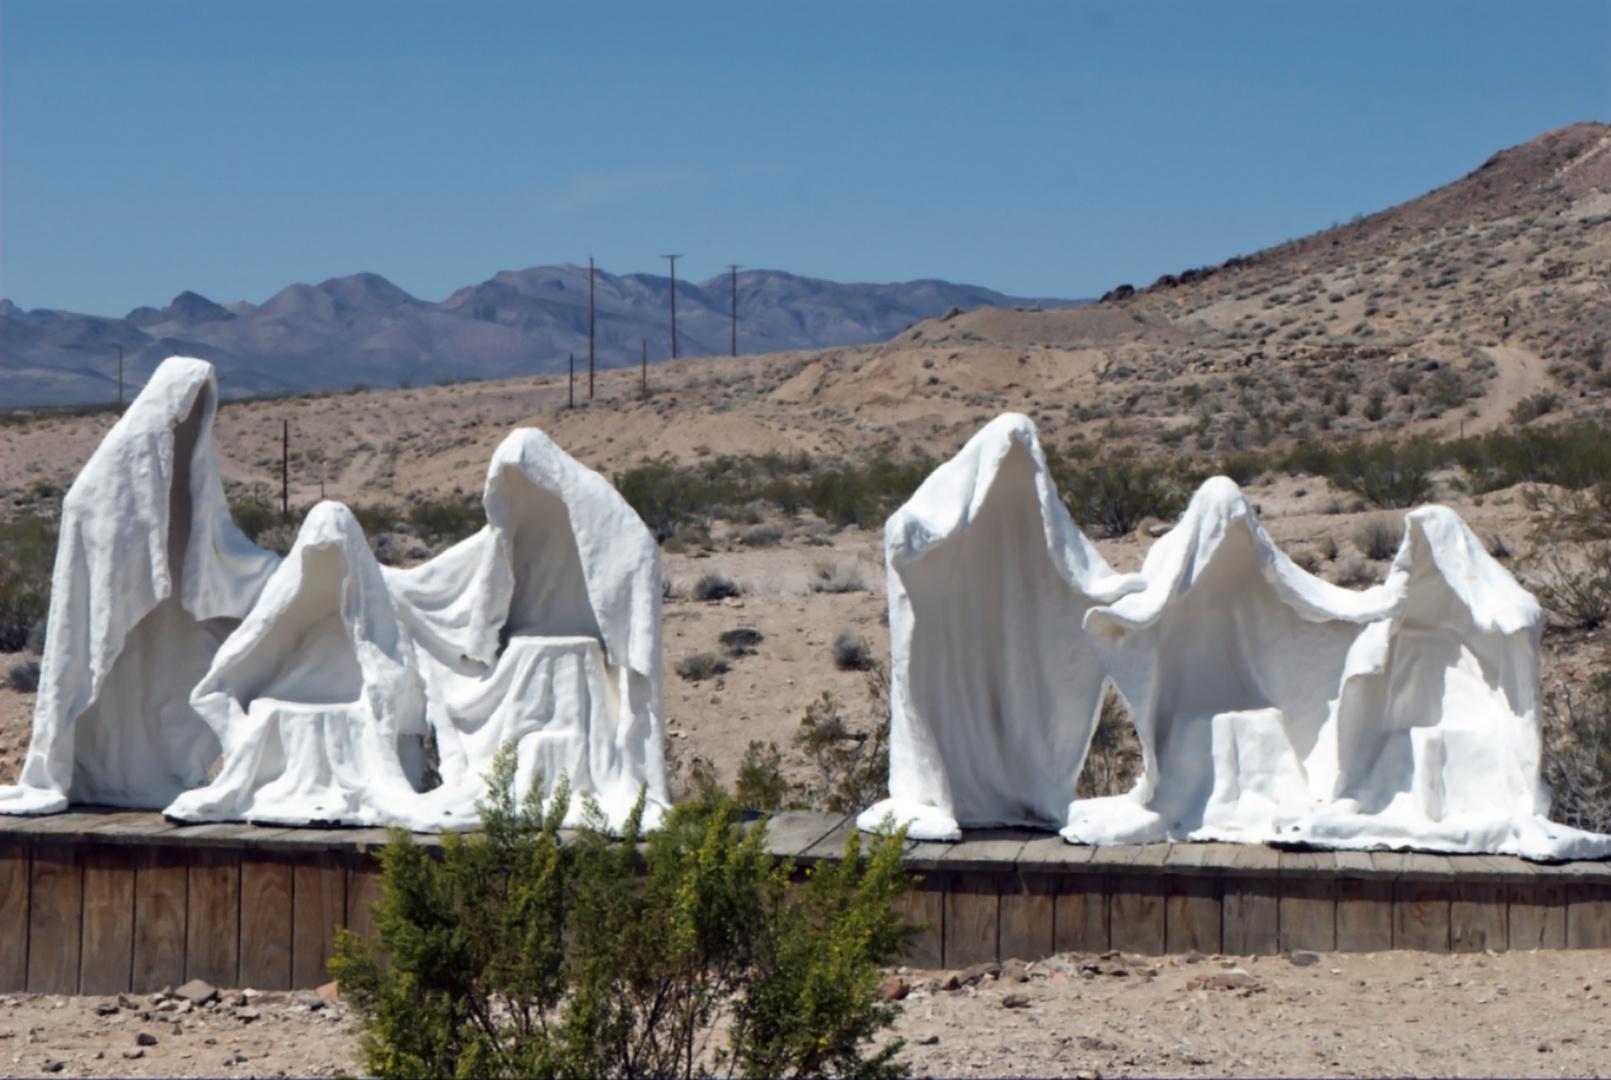 Ghosts in Rhyolite